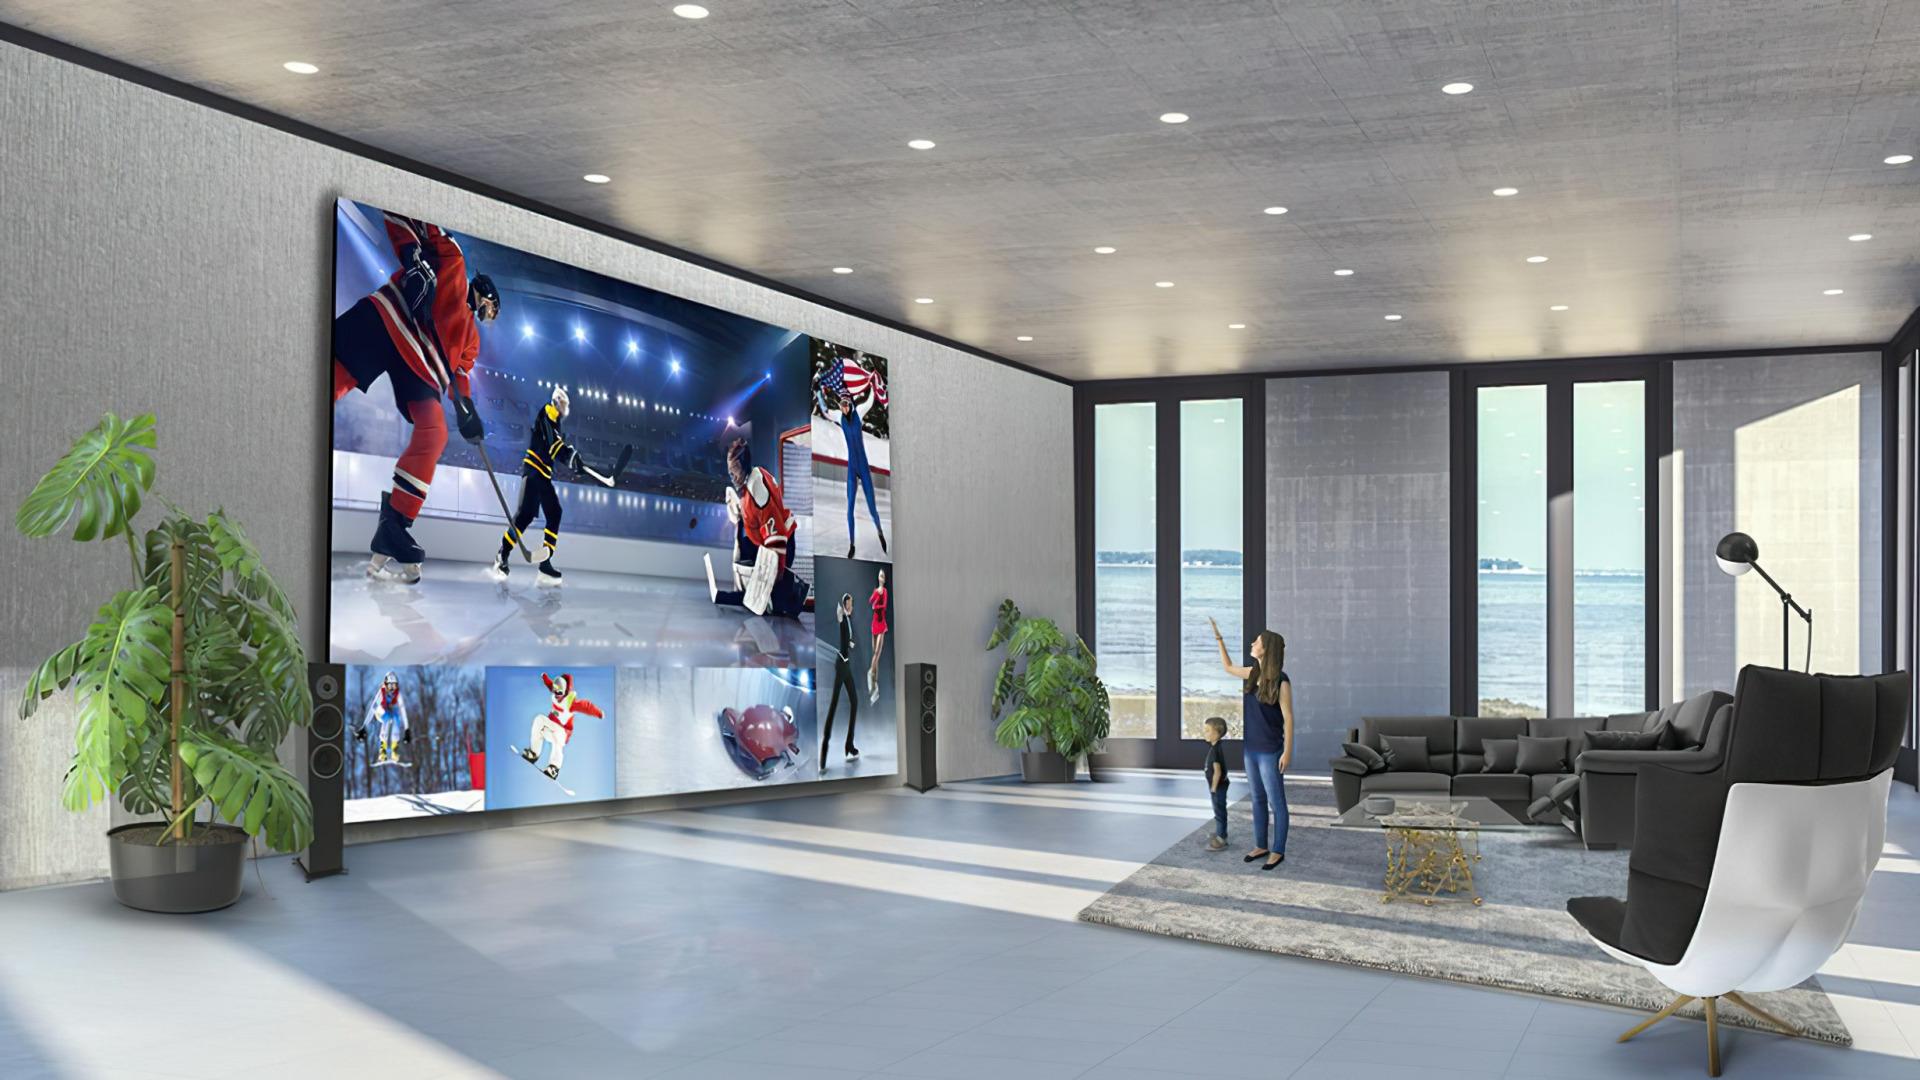 Display, LG, LG Electronics, Direct View LED Extreme Home Cinema Display